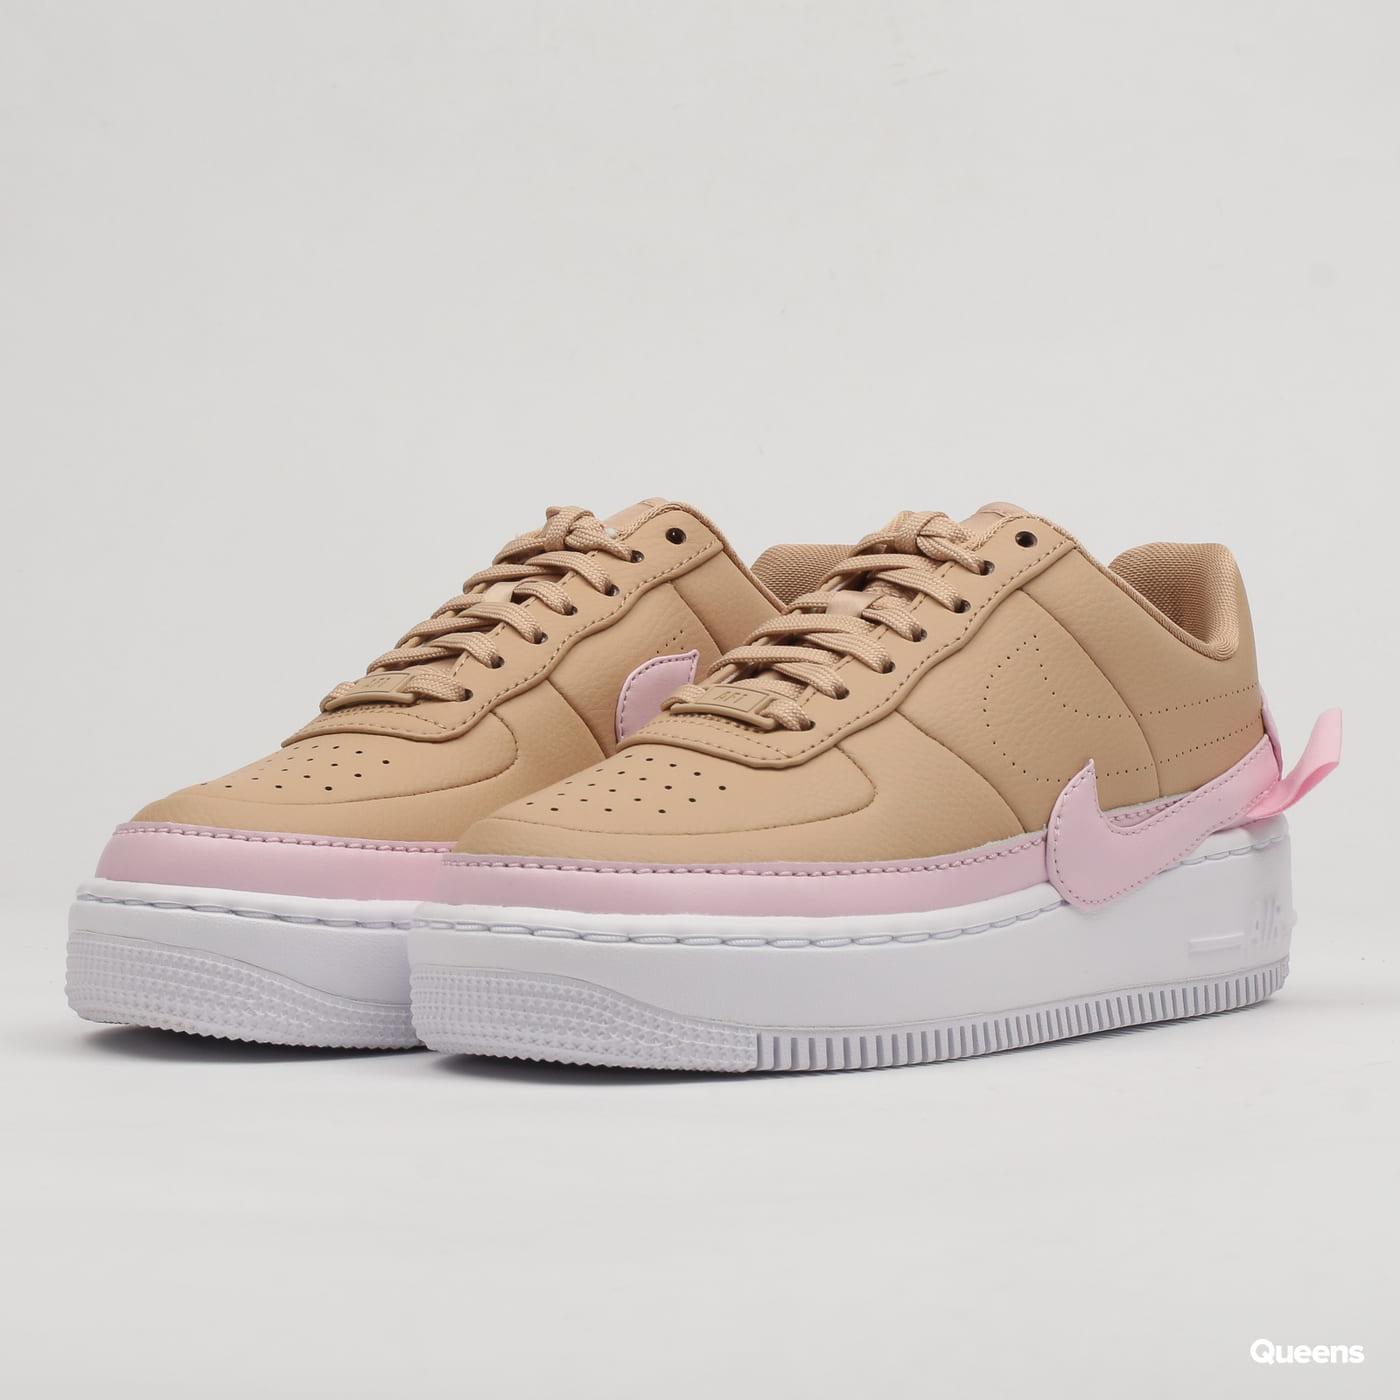 Nike W AF1 Jester XX biio beige / pink force - white